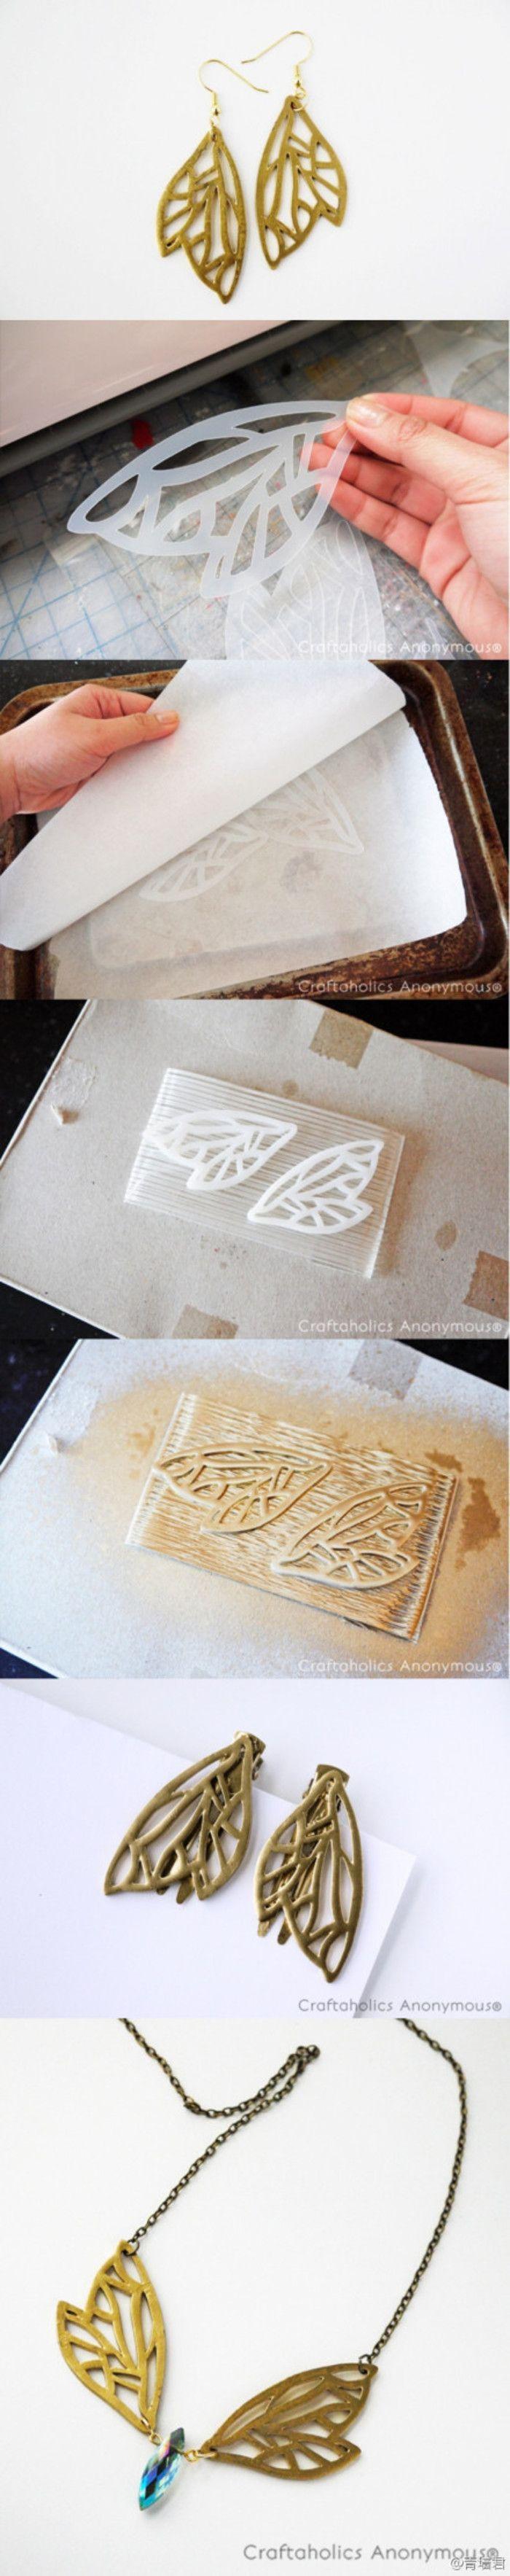 #shrink plastic tutorial#热缩片教程,这两个都比较有趣~第一个做法是裁剪烘烤喷漆,可塑性极大。第二个相当碉堡,作者June Gilbank凭着这篇PDF得到了许多募捐,想法确实棒。第三张图,是热缩片在烤箱里的动态过程哦~